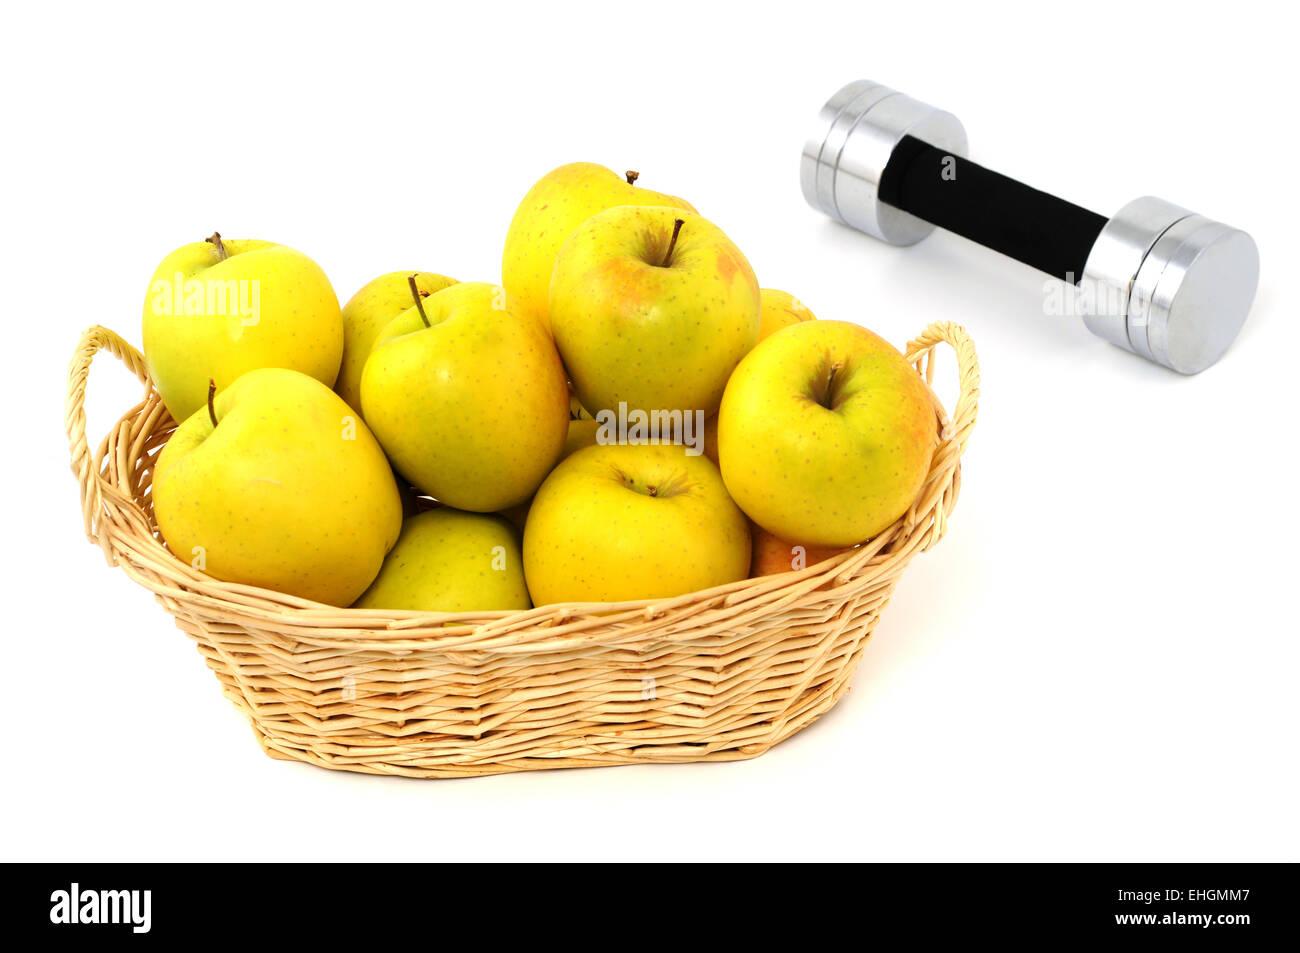 gesundes essen heathy eating stock photo 79658103 alamy